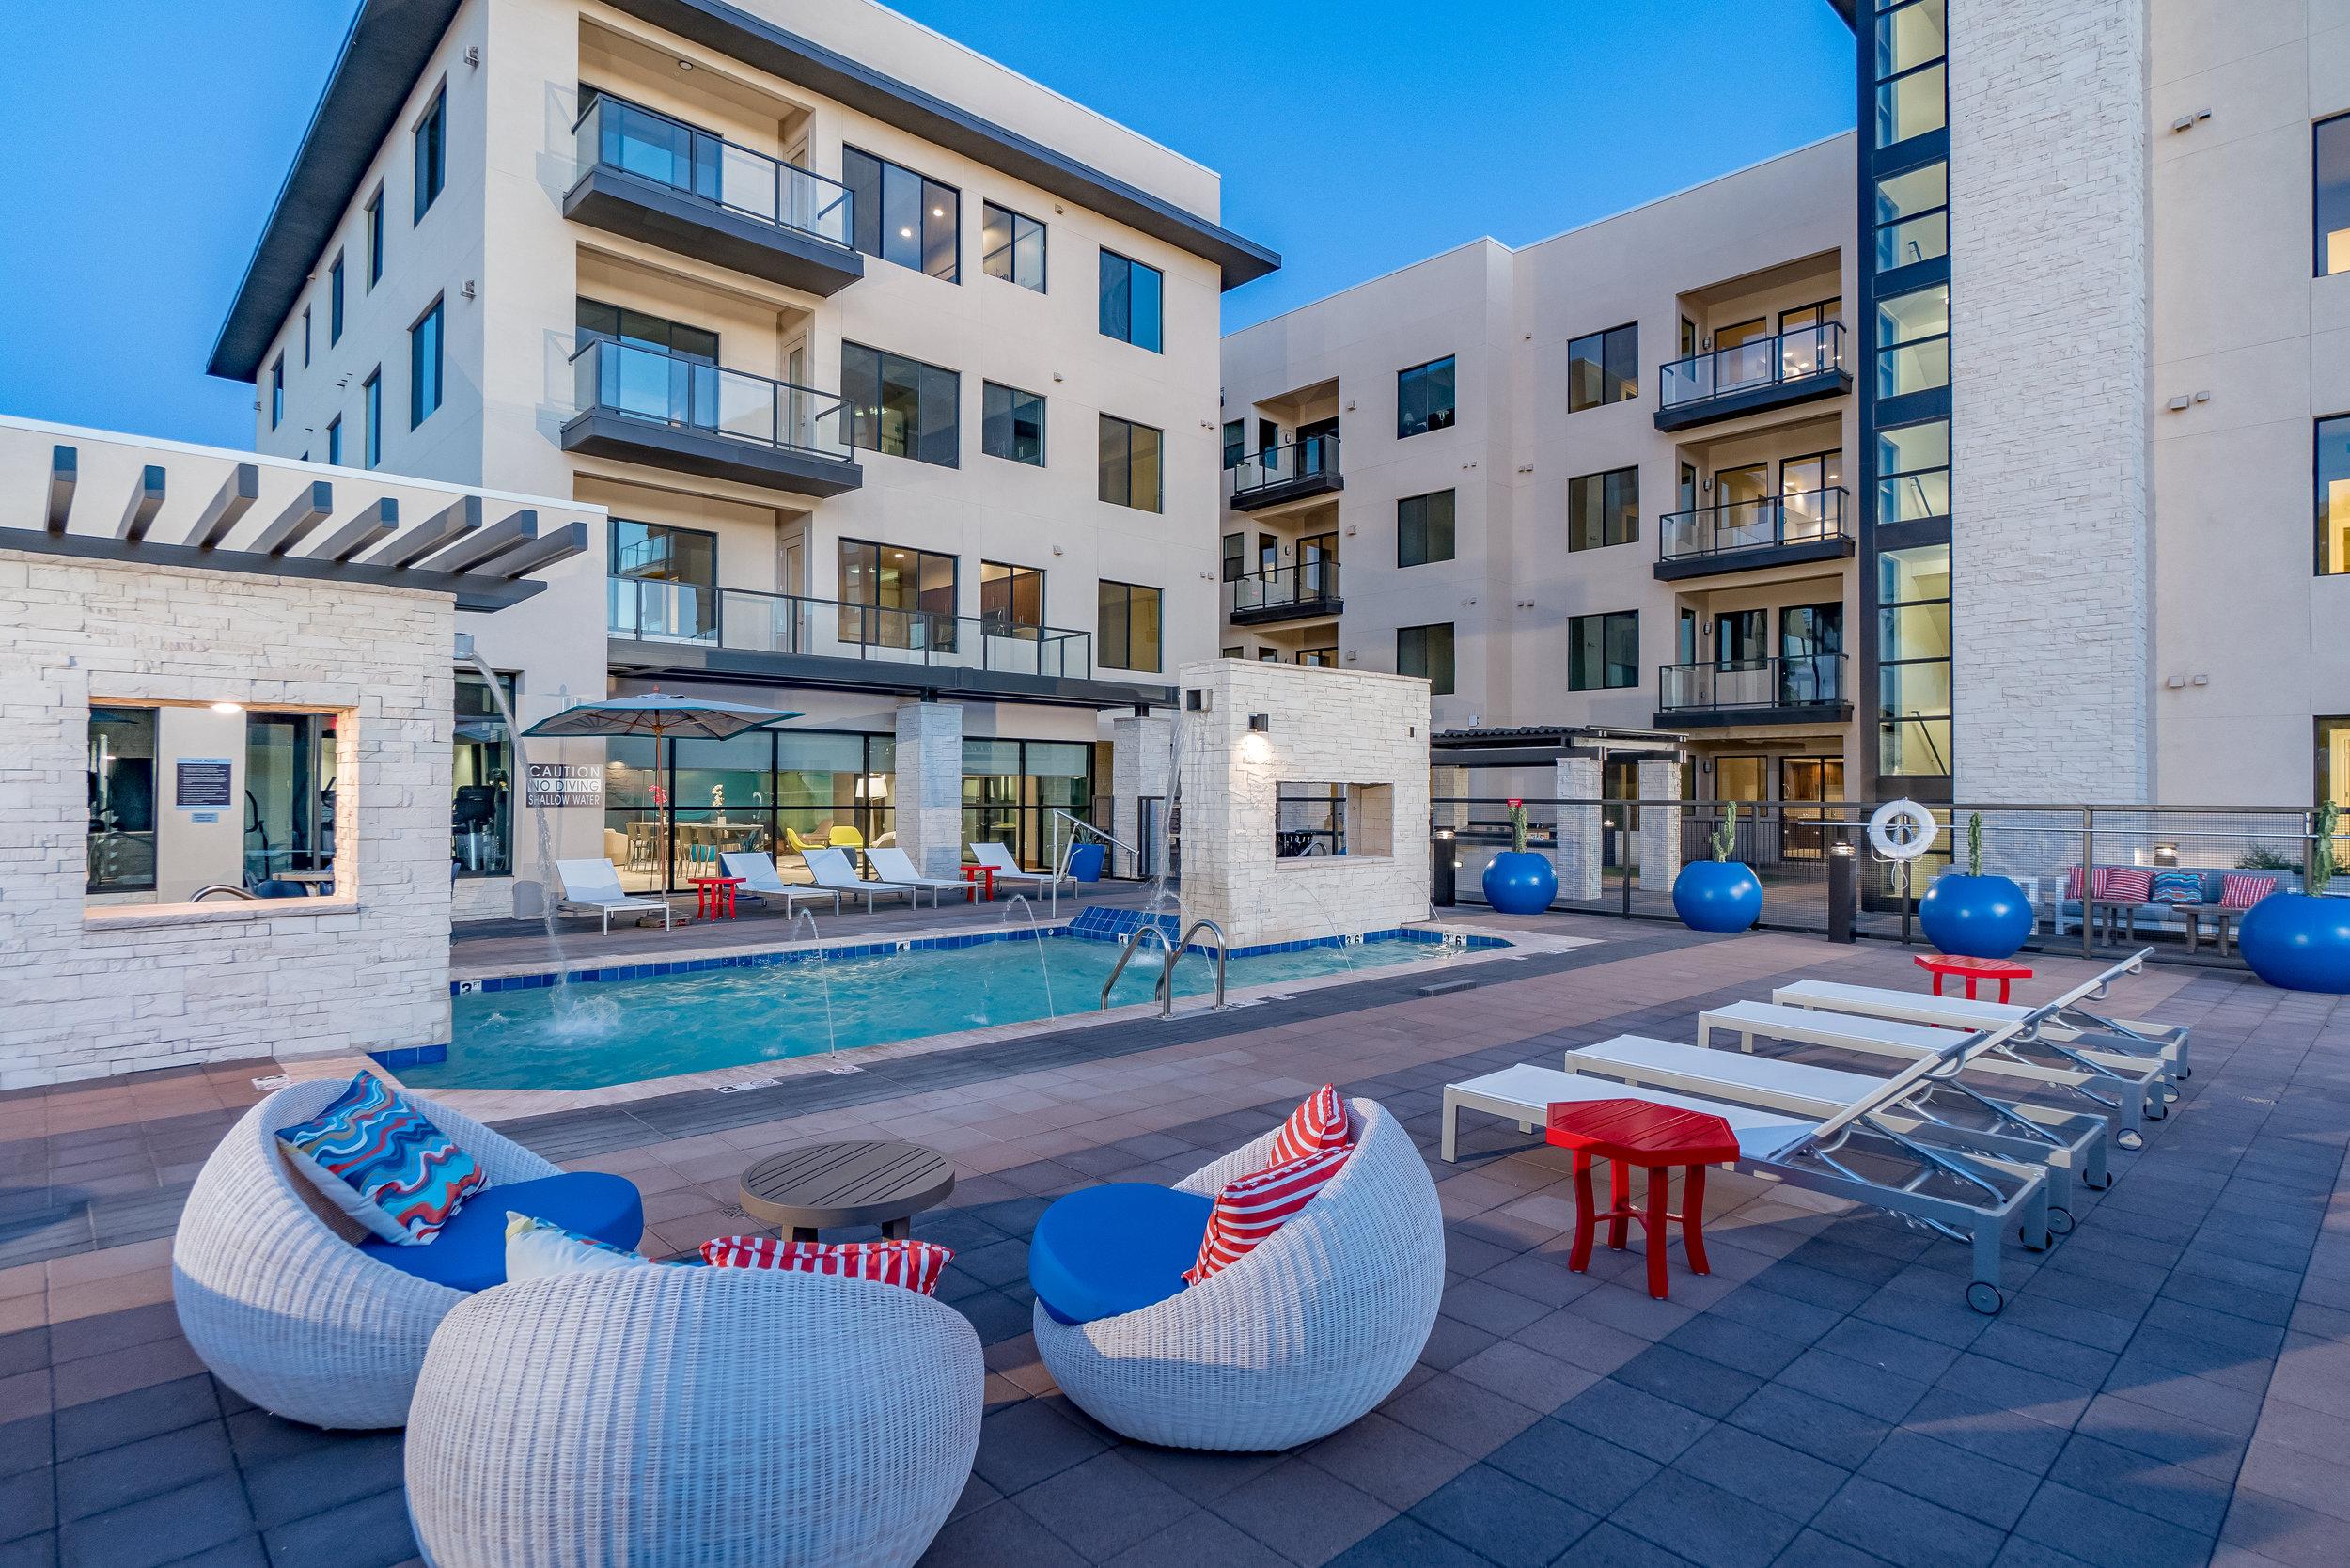 inspire-pool-area